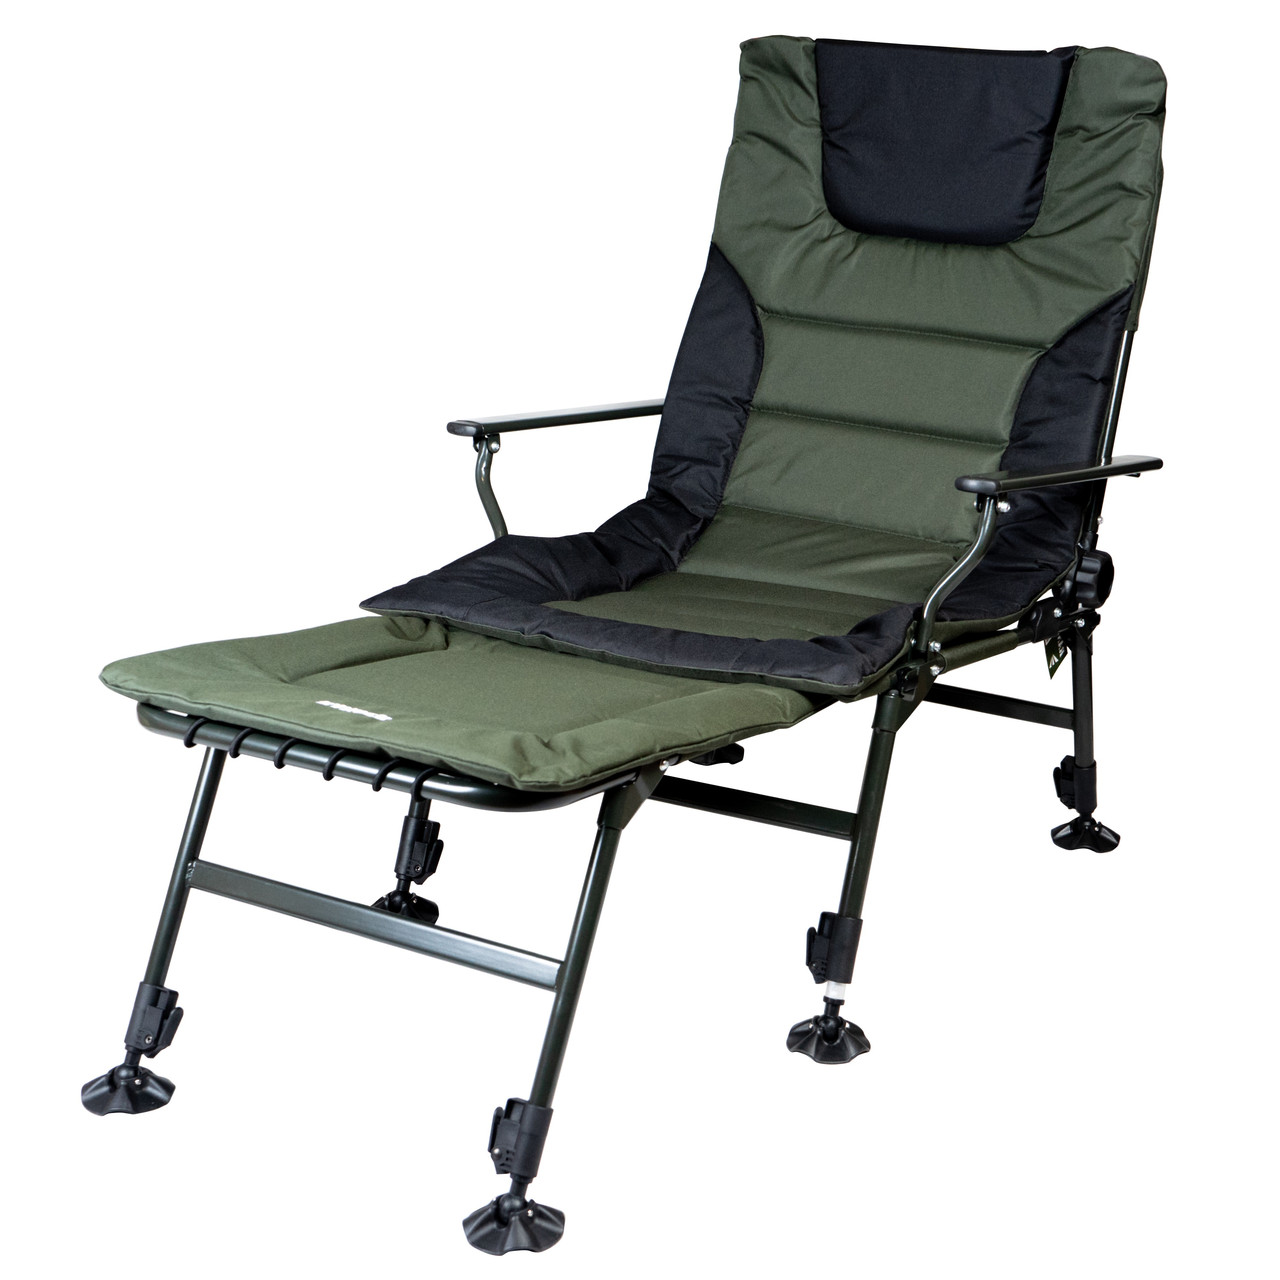 Карповое кресло Ranger Wide Carp SL-105+prefix (Арт. RA 2234)